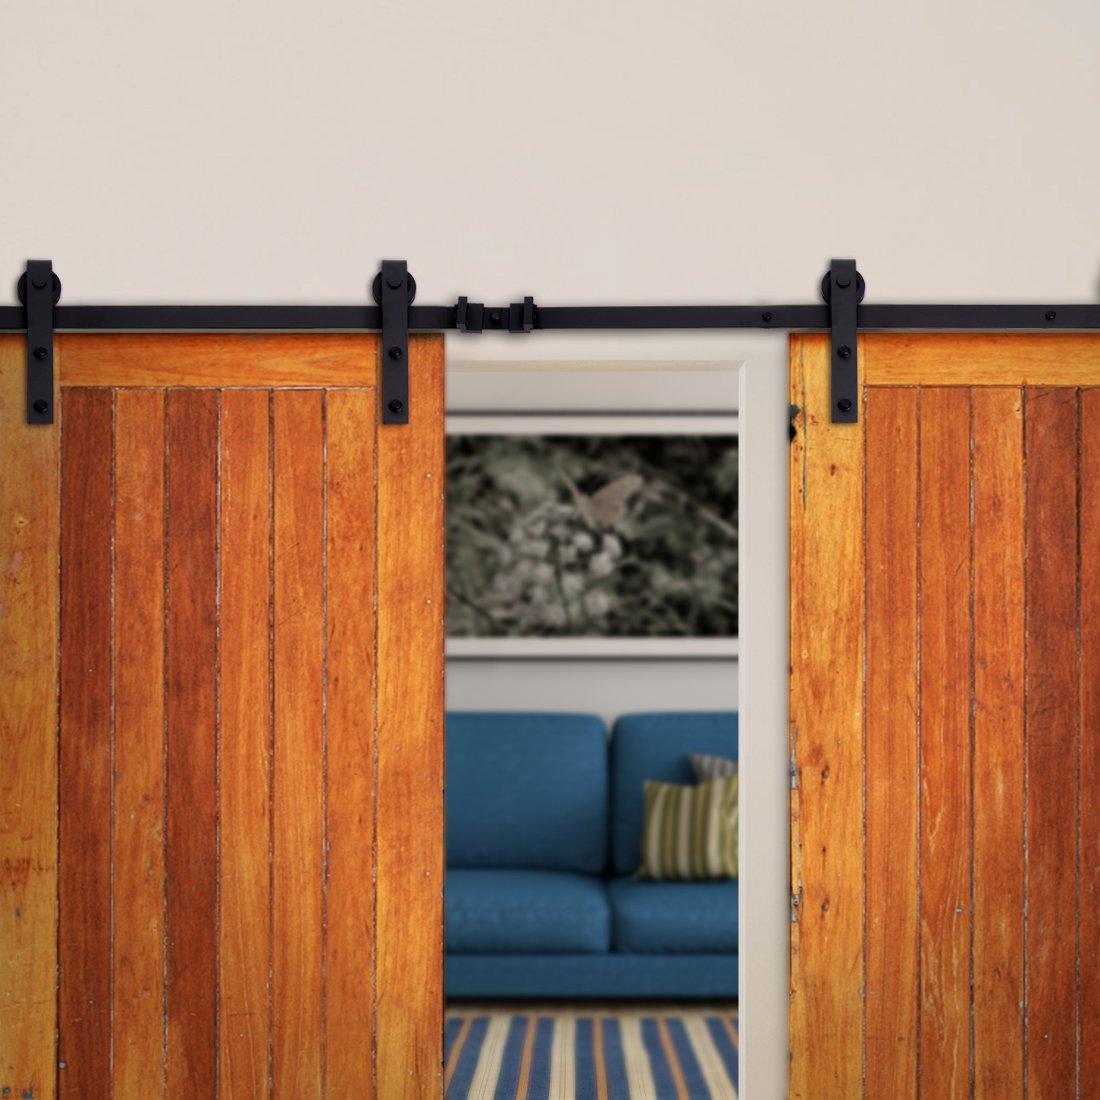 GOOD LIFE 12 FT Sliding Barn Door Hardware Track System Kit Double Wood Door Sliding Interior DIY Wall Mount Guide Set Dark Coffee Antique Style HMI067 by GOOD LIFE USA (Image #1)